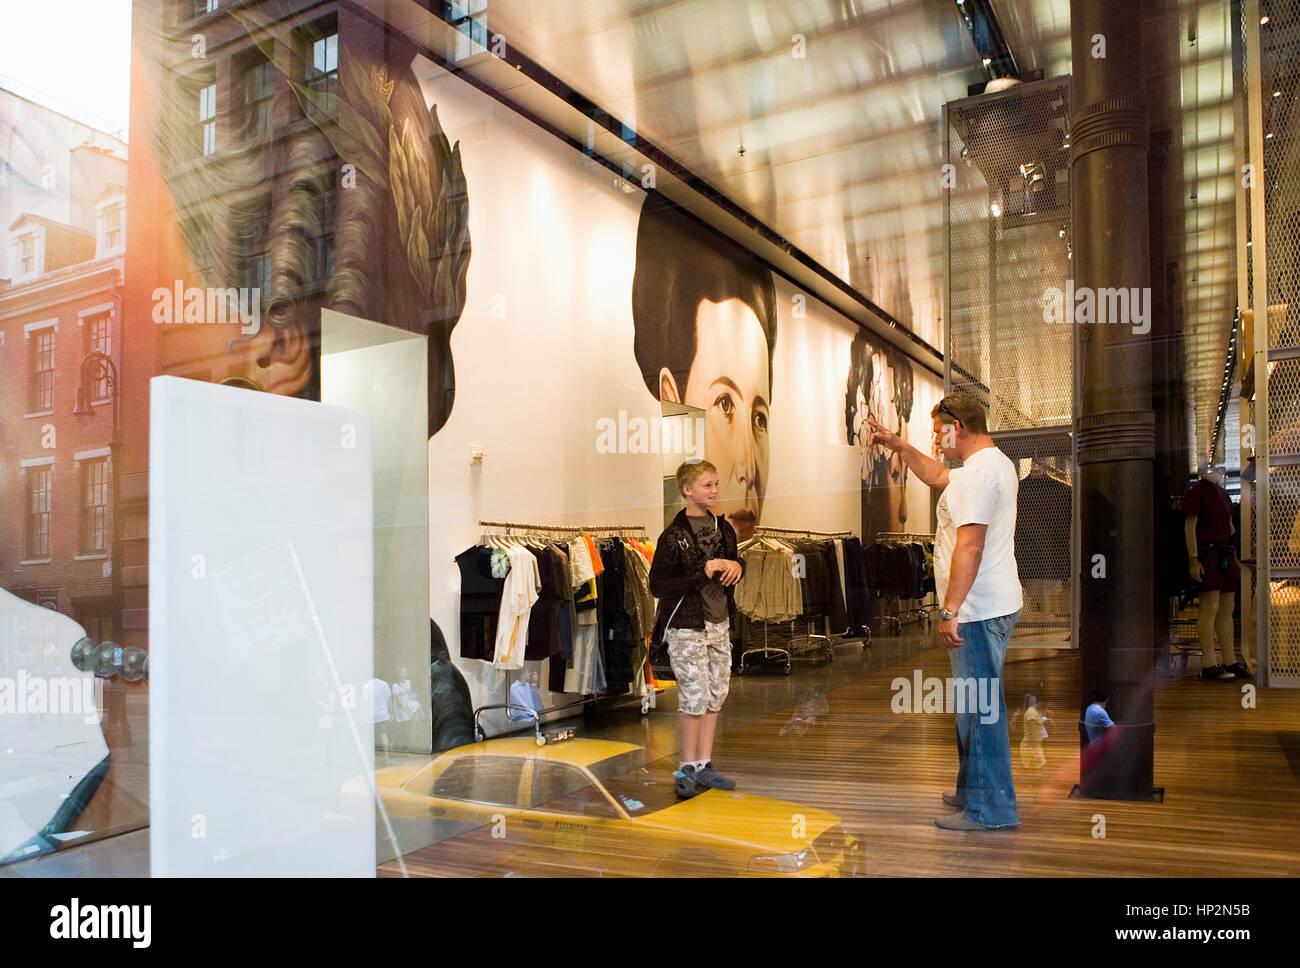 Prada Store Nyc Photos   Prada Store Nyc Images - Alamy 82b6b92cd34